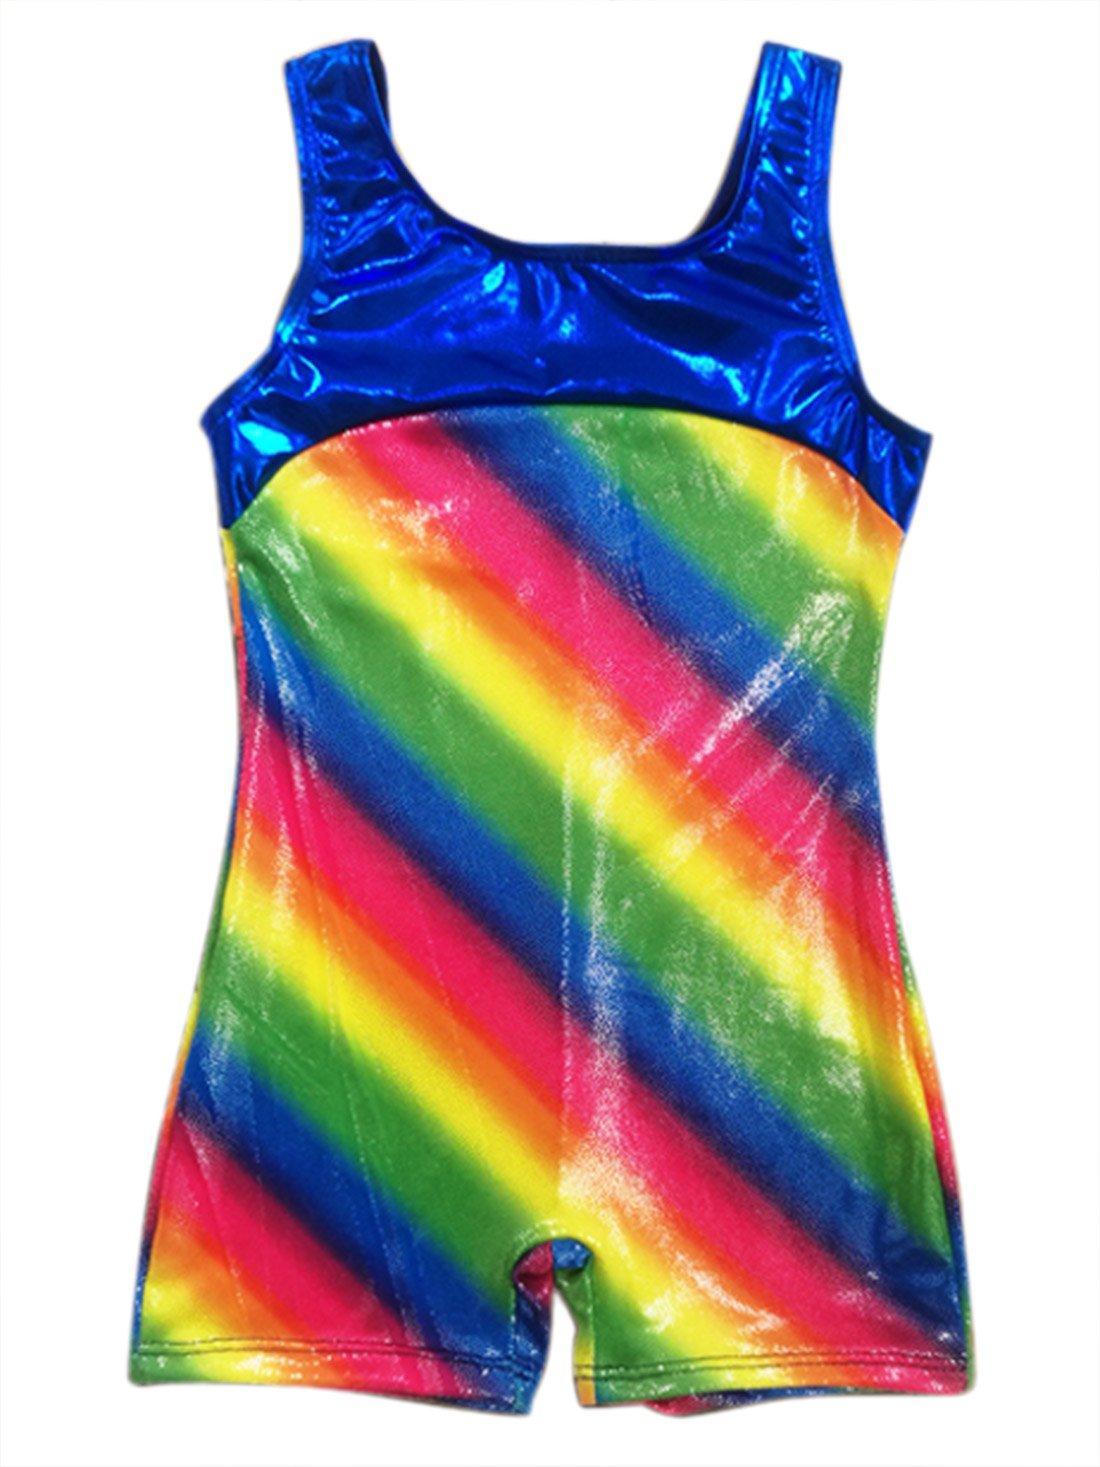 Girls' Team Basic Sleeveless Leotard Spandex Dancewear Ballet Outfit Active Gymnatsics Leoatrds - 3-4Y - Rainbow Happy Cherry